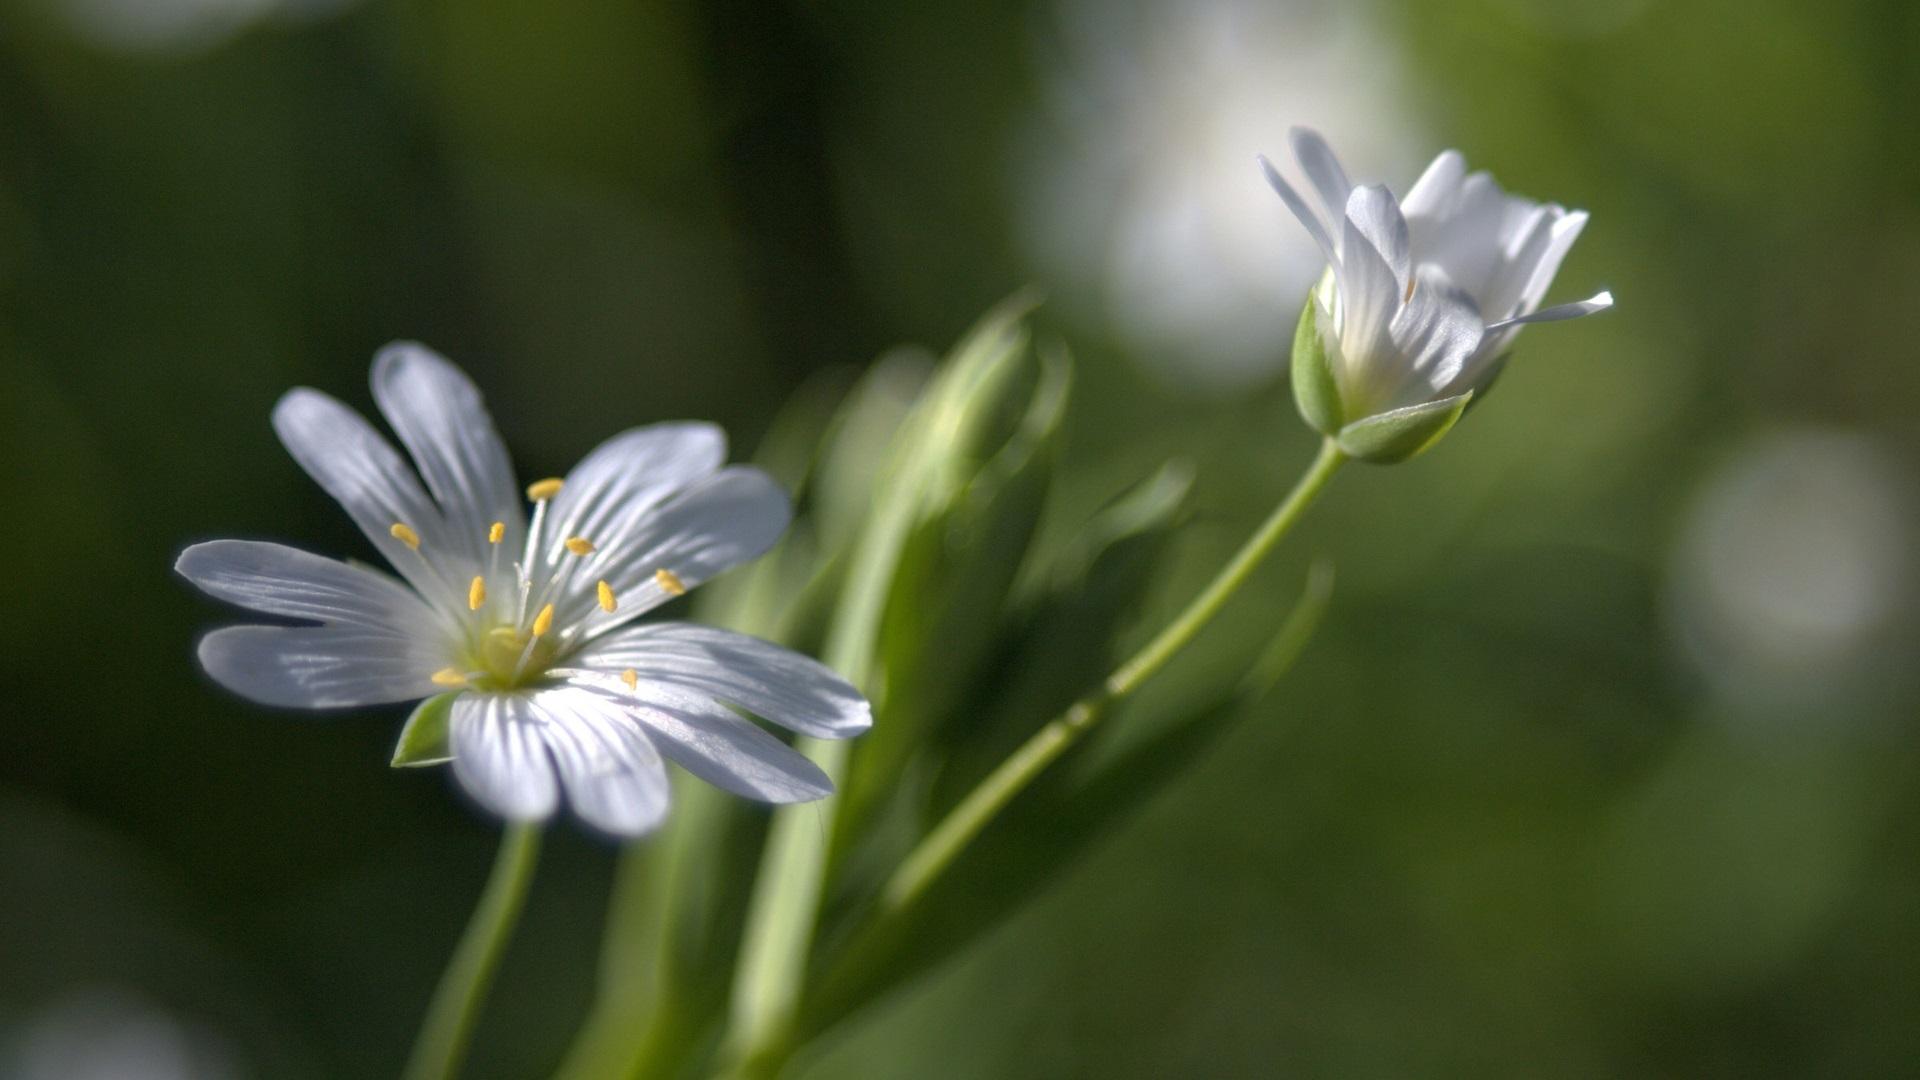 white flower wallpaper 1920x1080 - photo #27